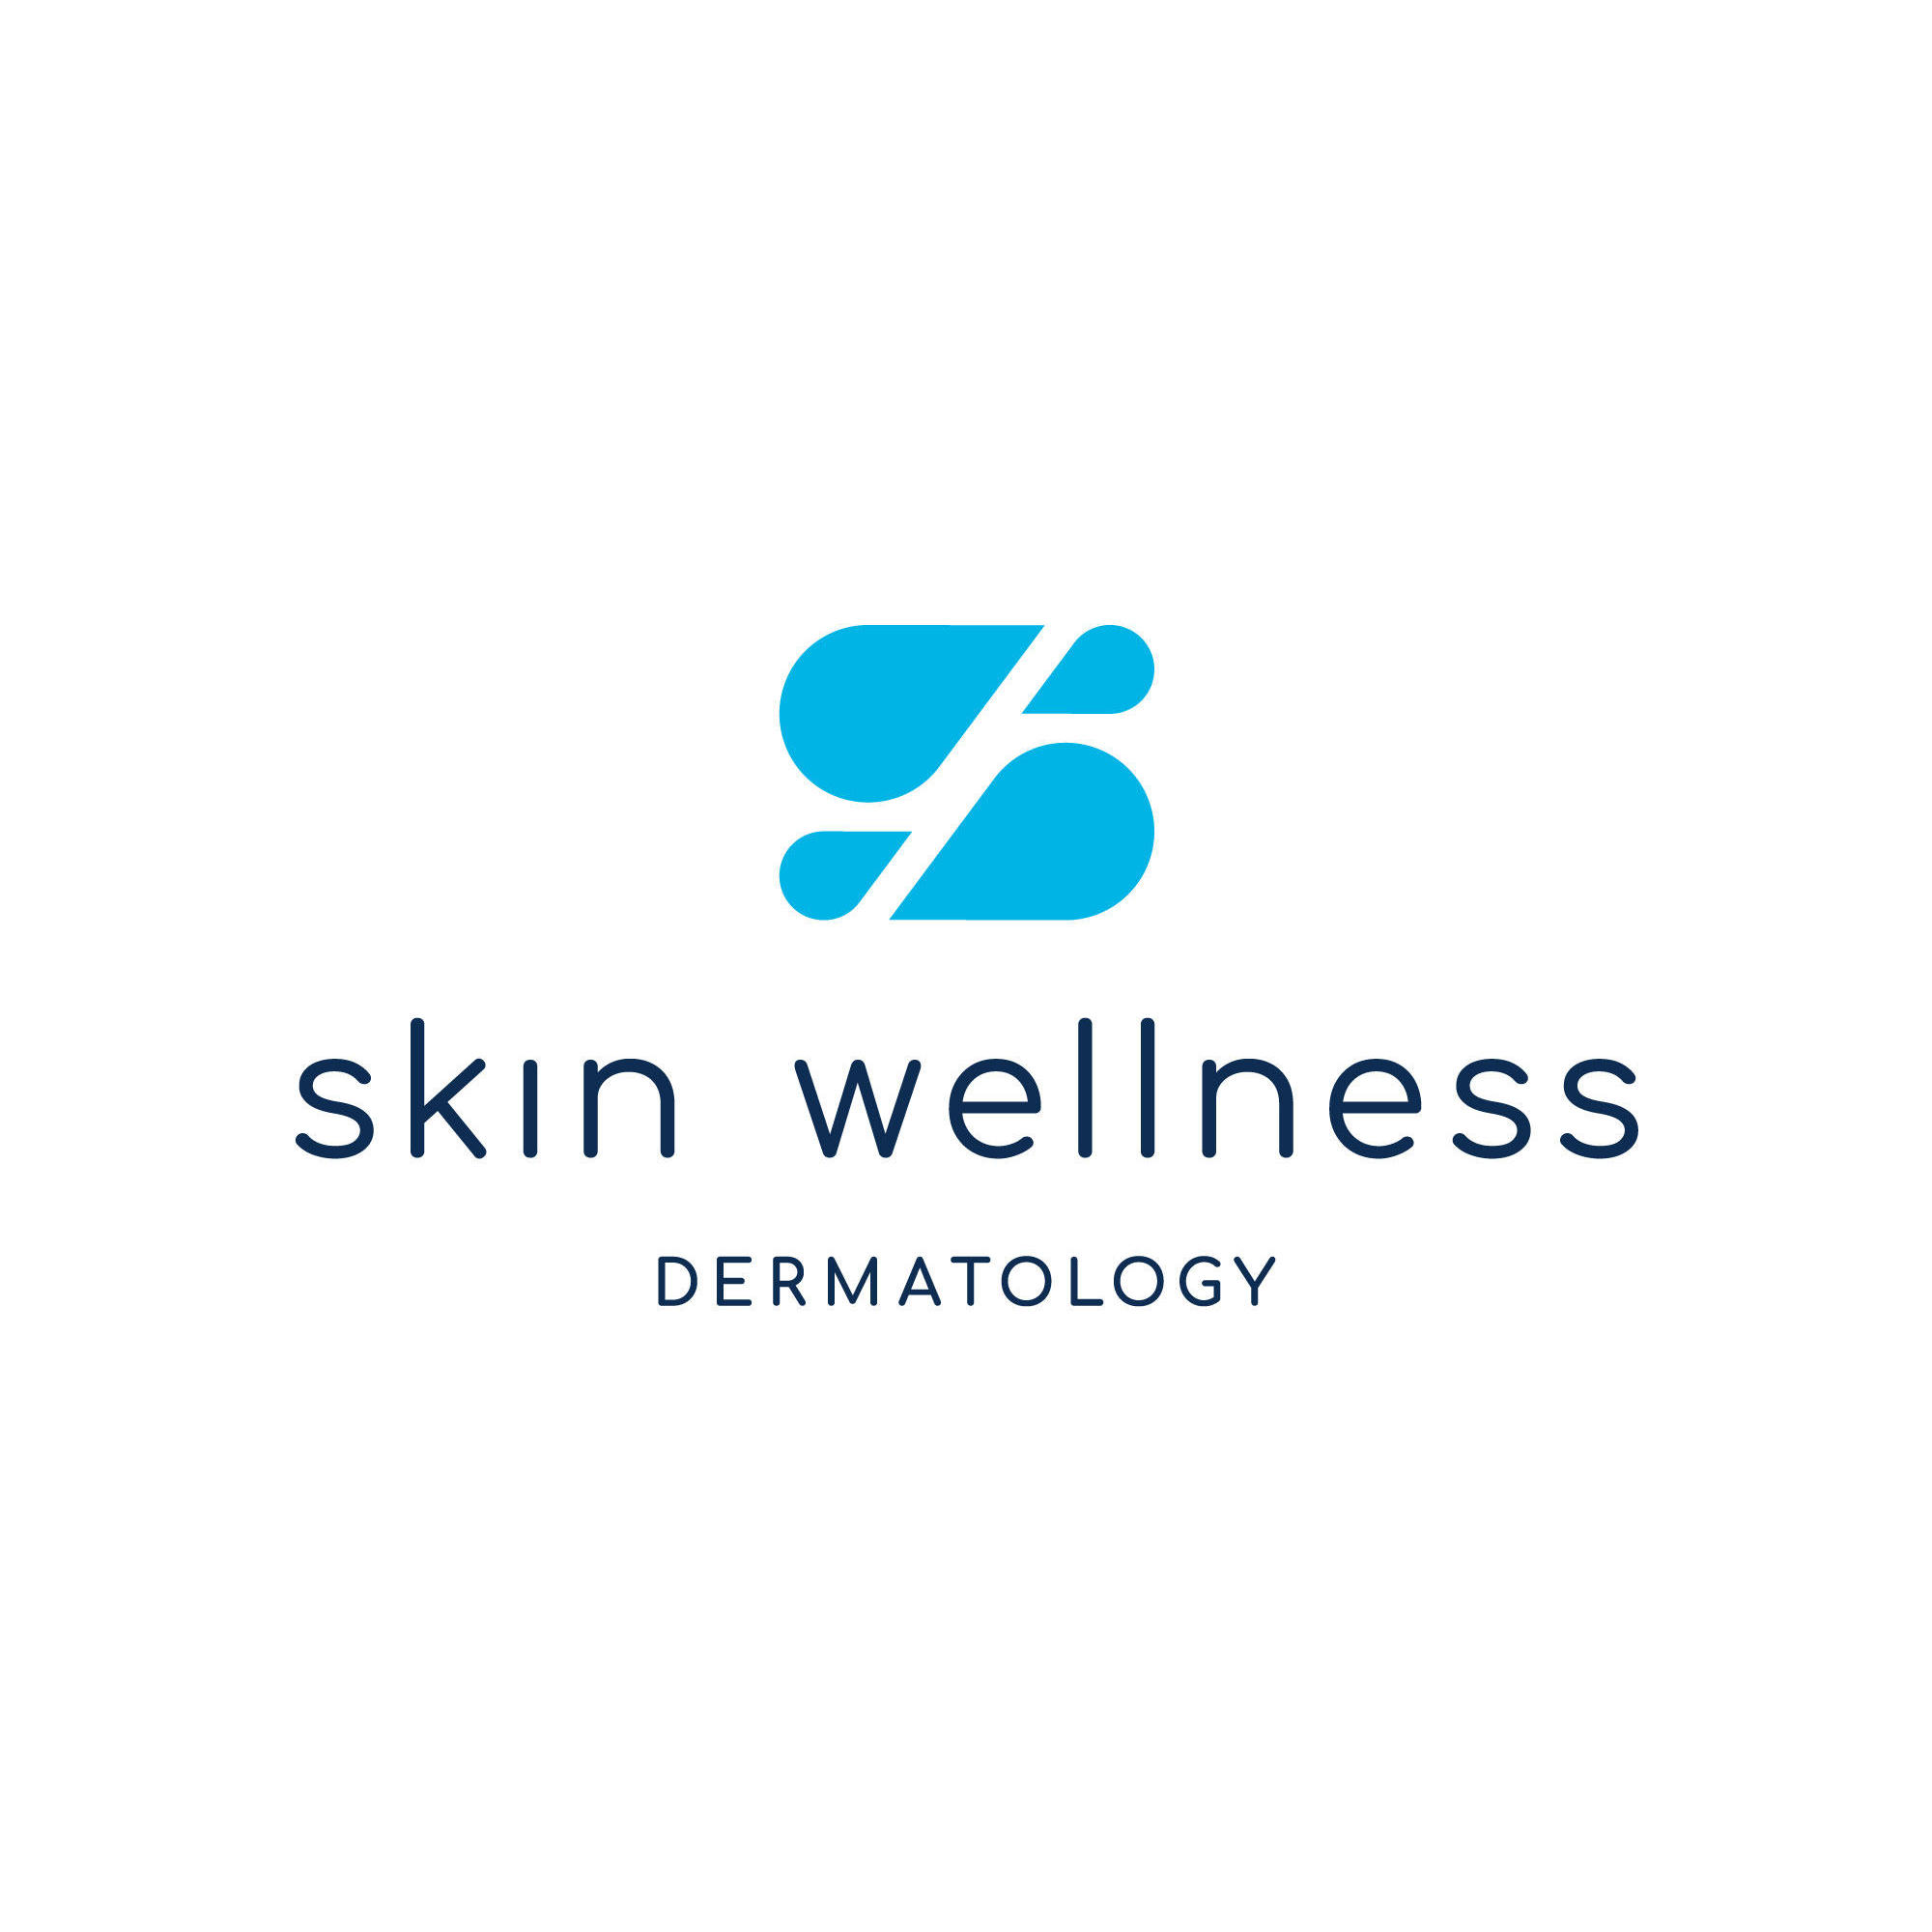 Skin Wellness Dermatology